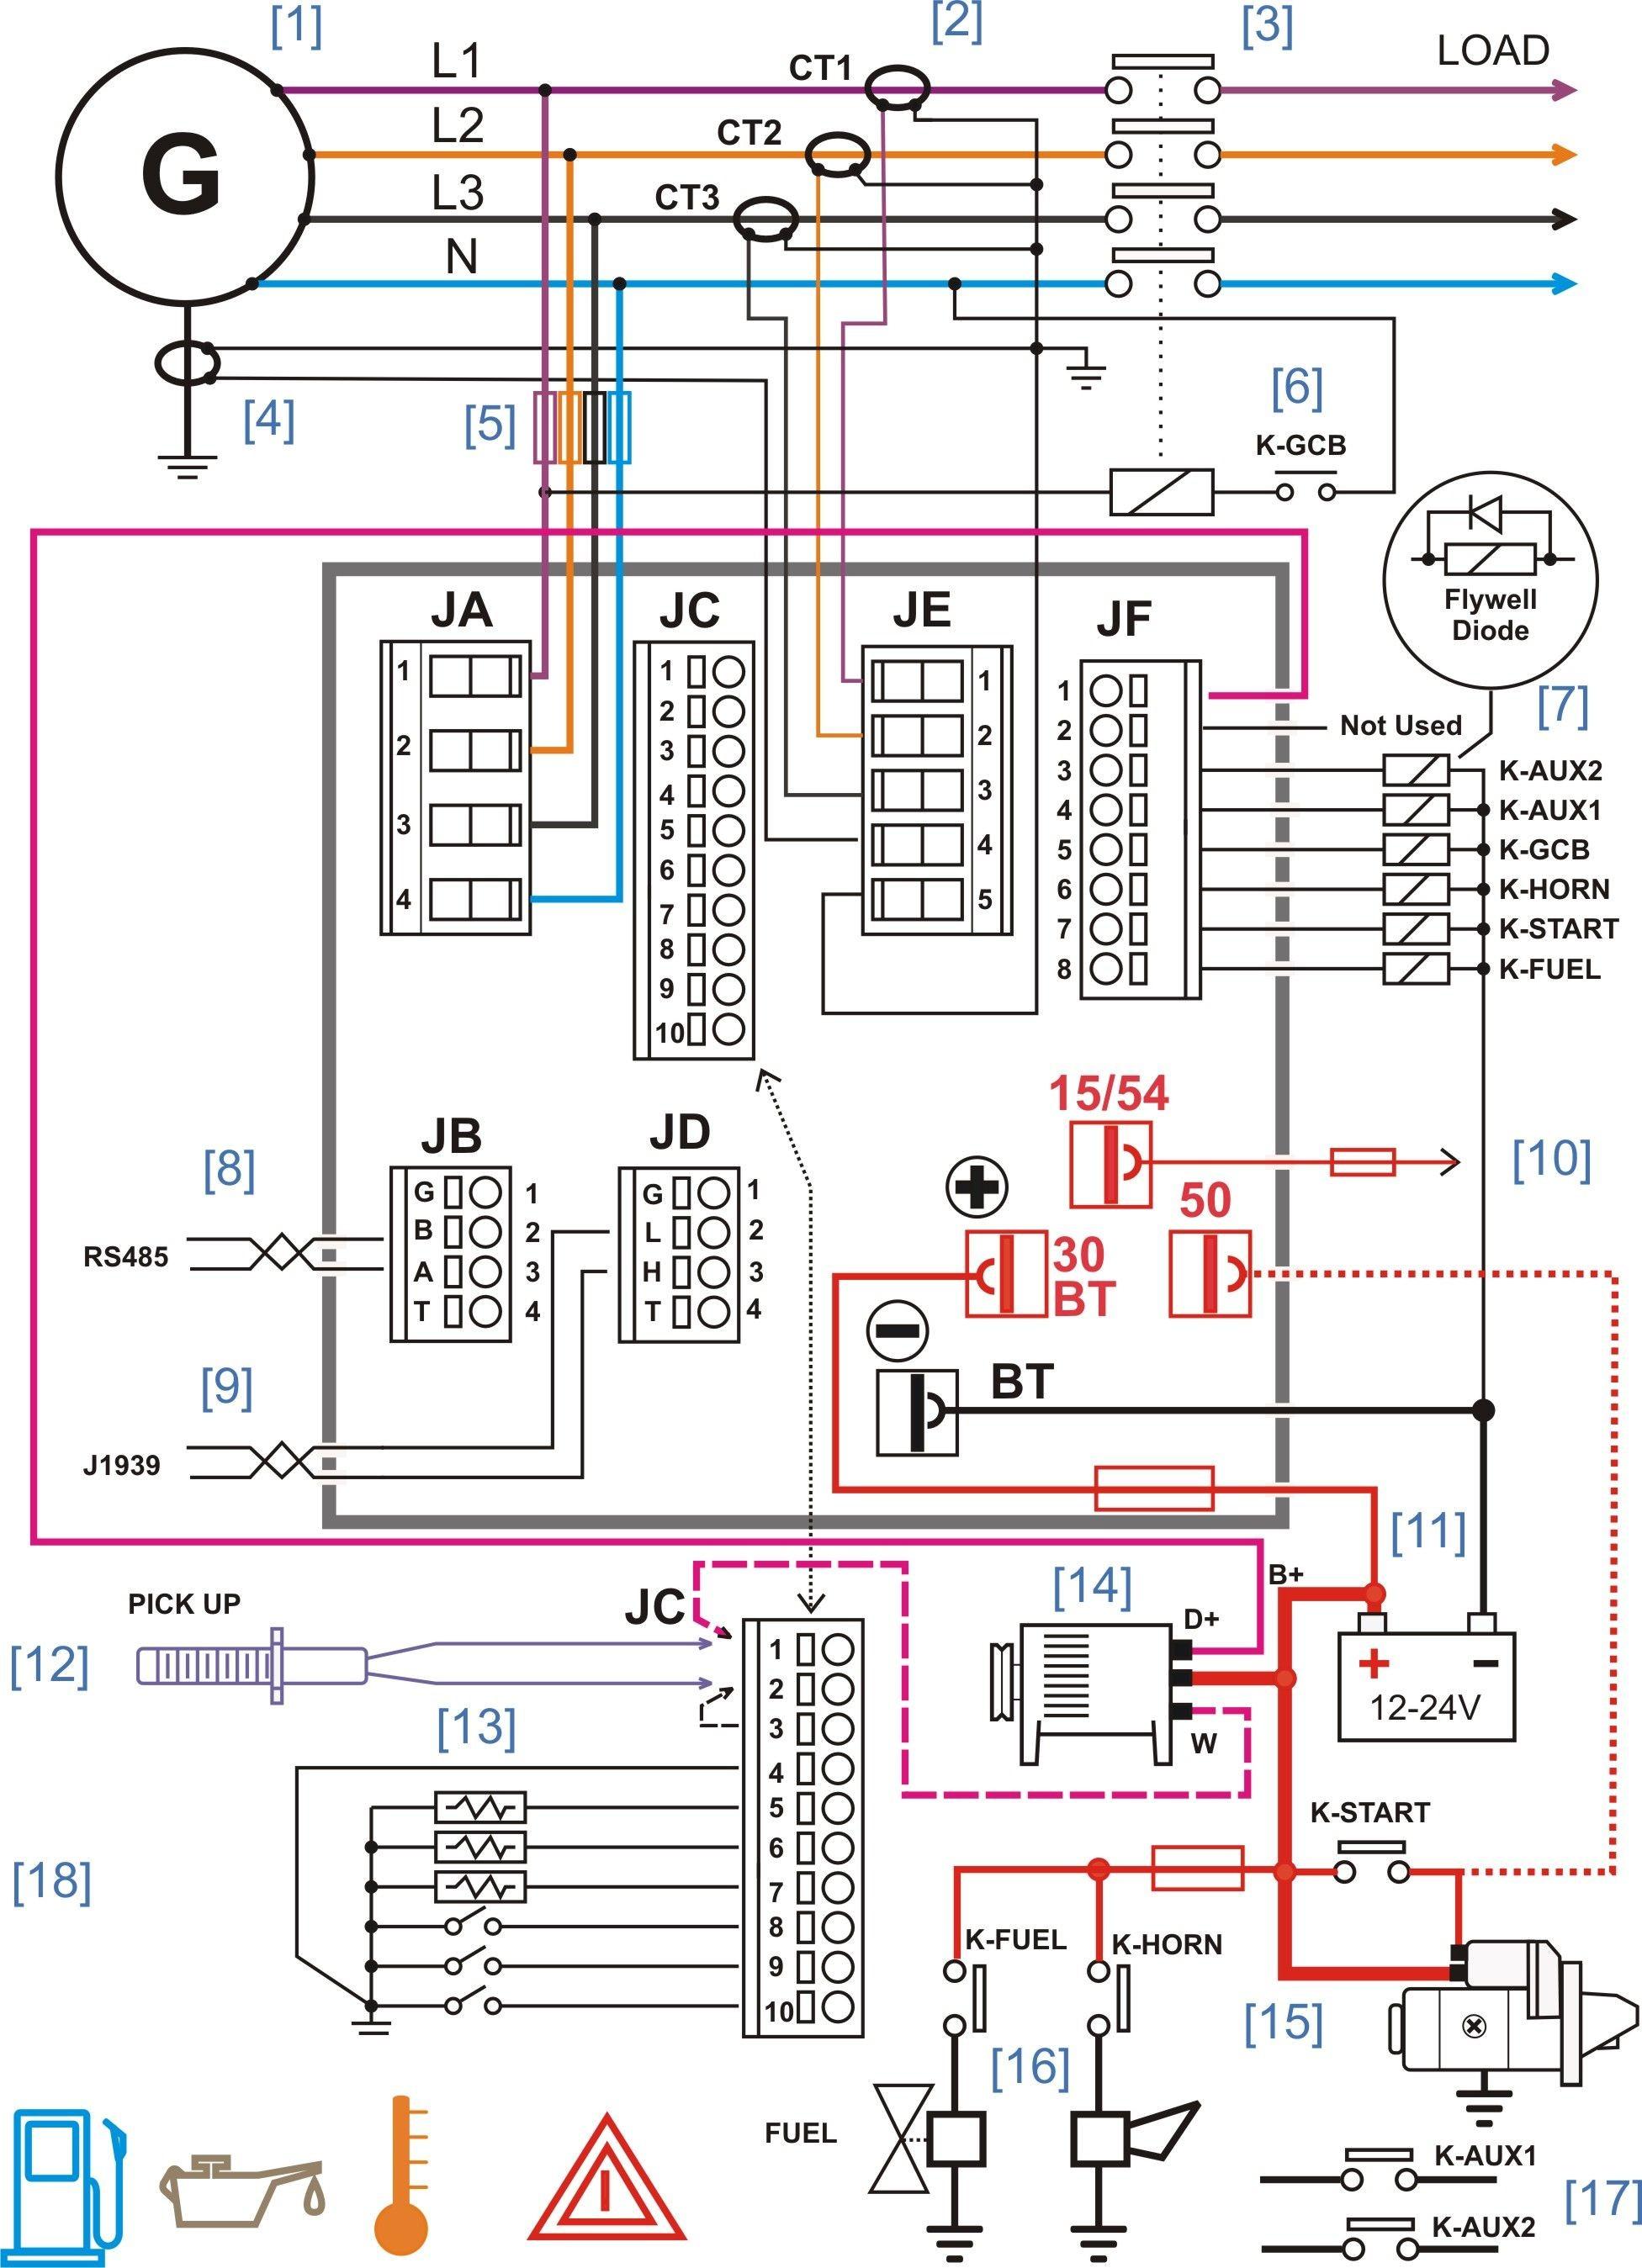 hight resolution of wiring diagram detail name generator wiring diagram and electrical schematics pdf diesel generator control panel